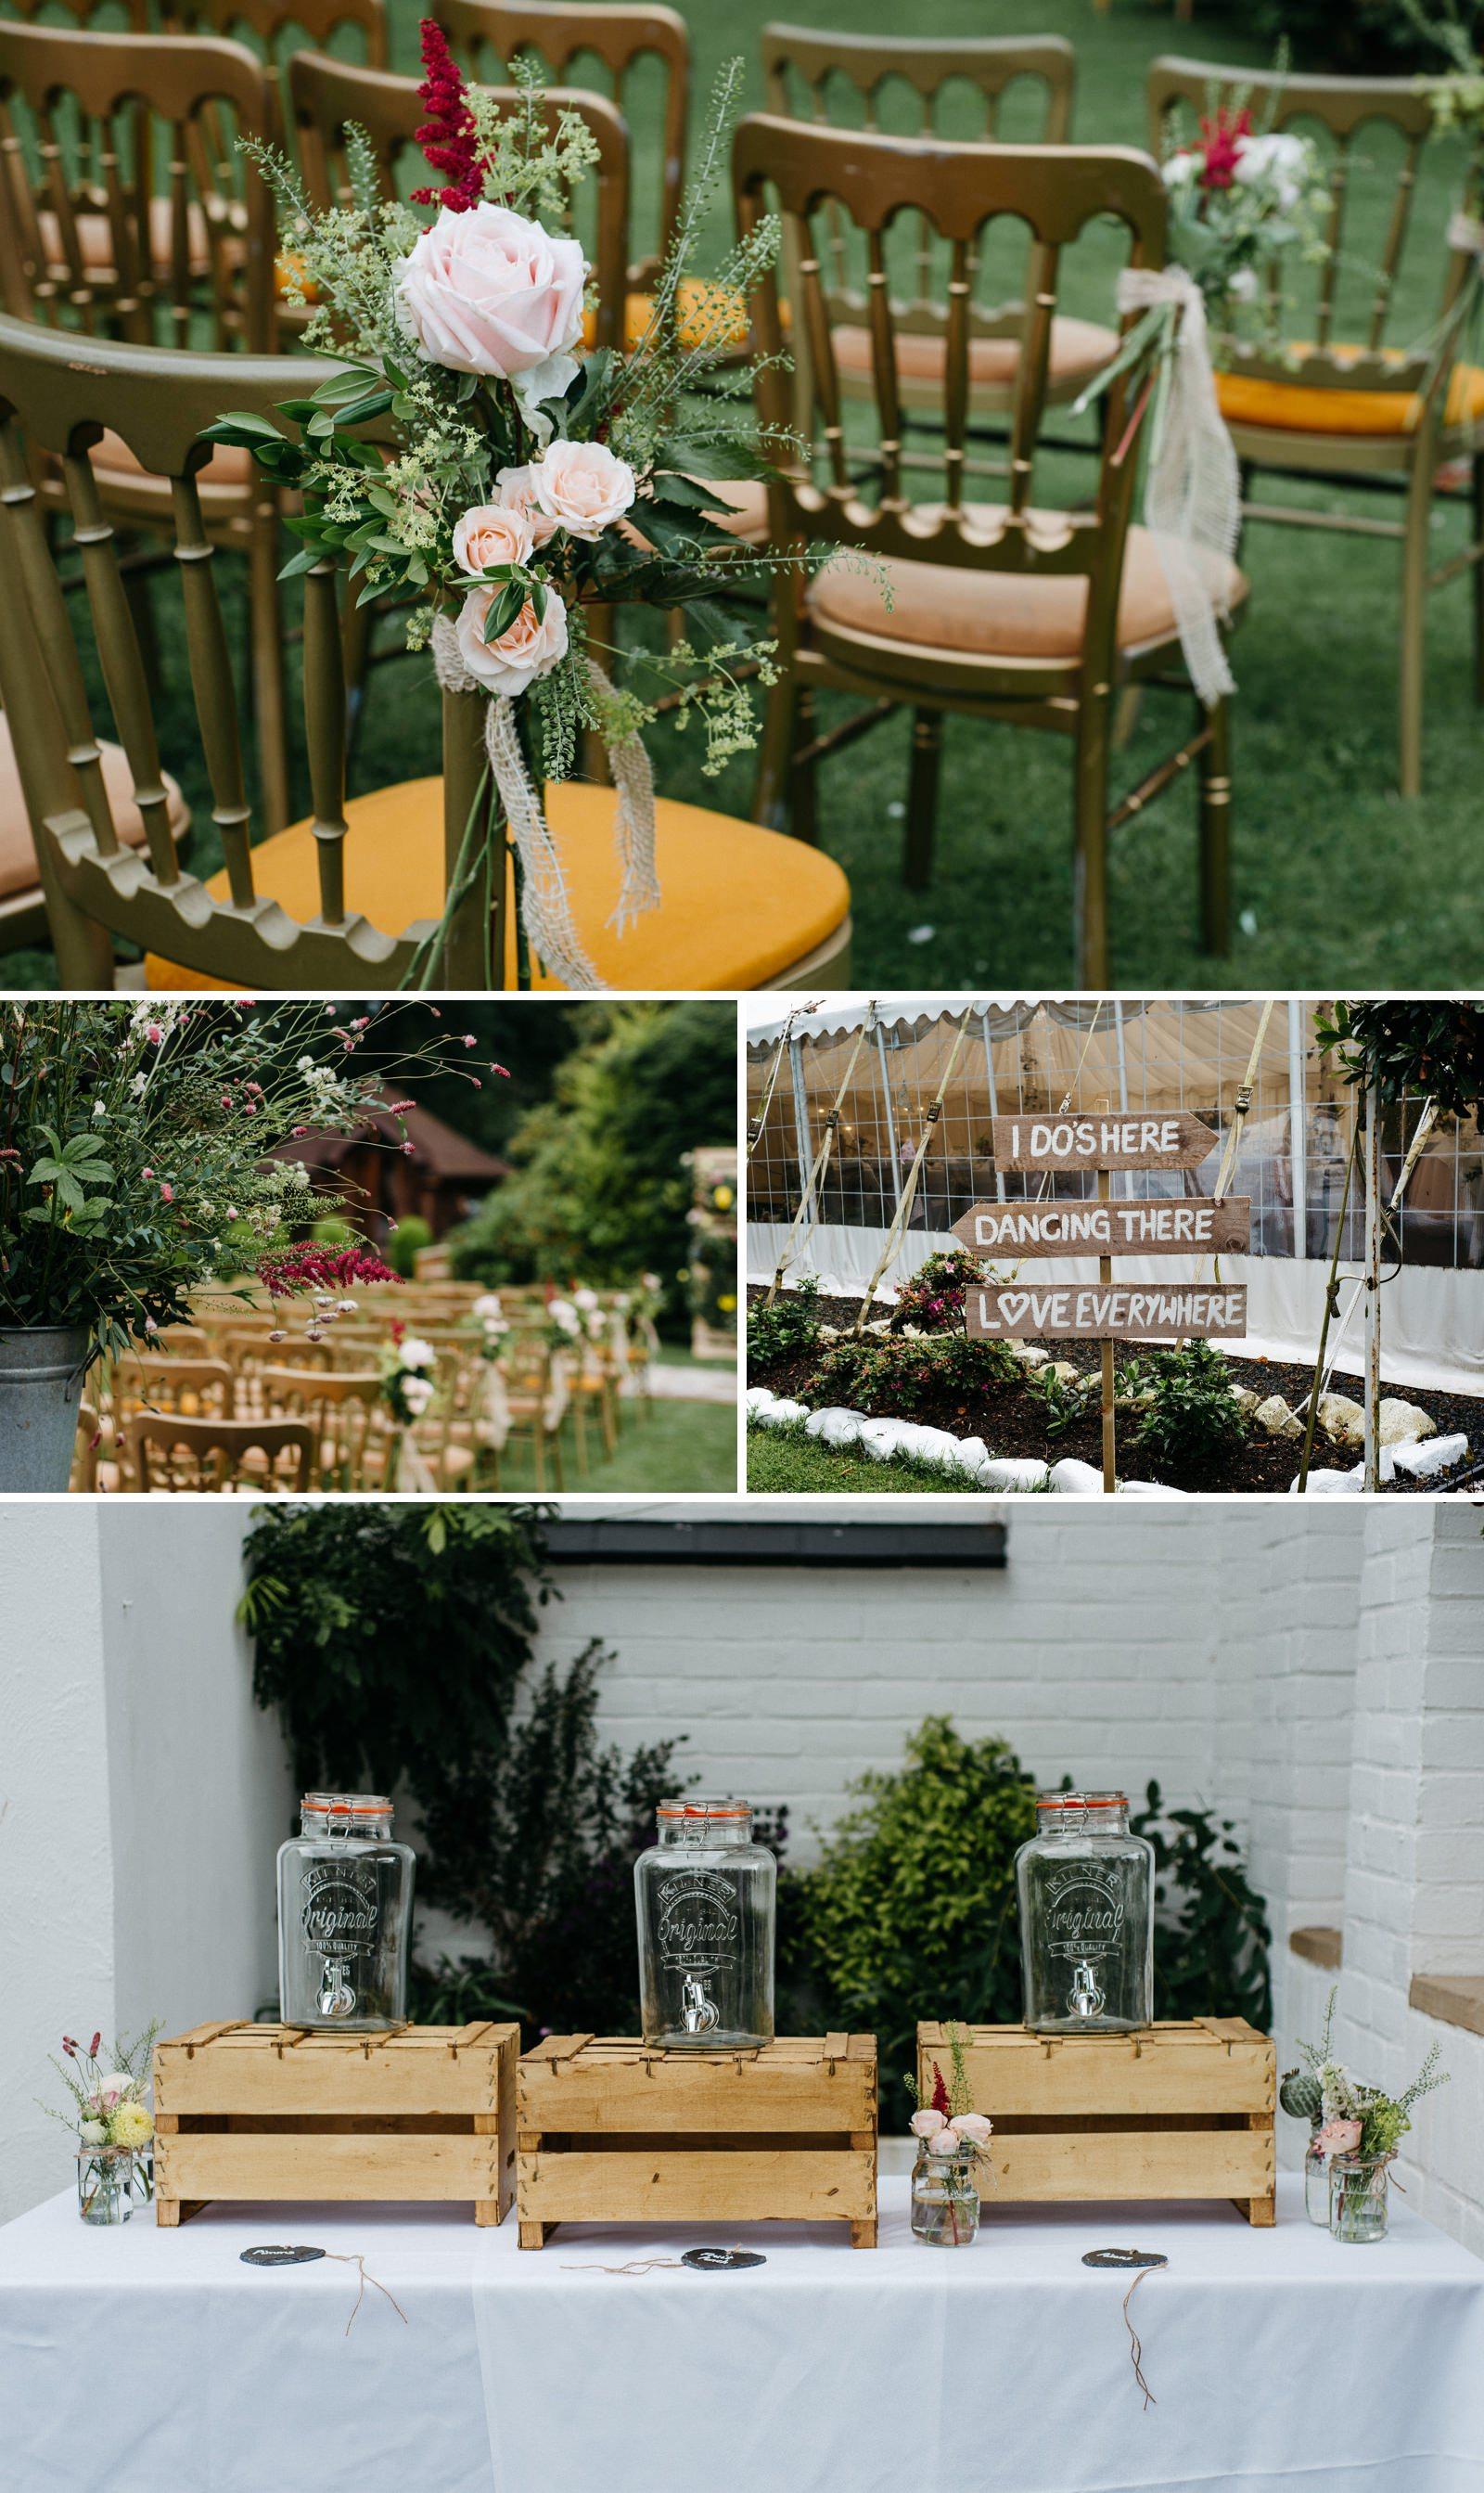 Alternative decor details at Enterkine House Hotel wedding in Ayrshire, Scotland